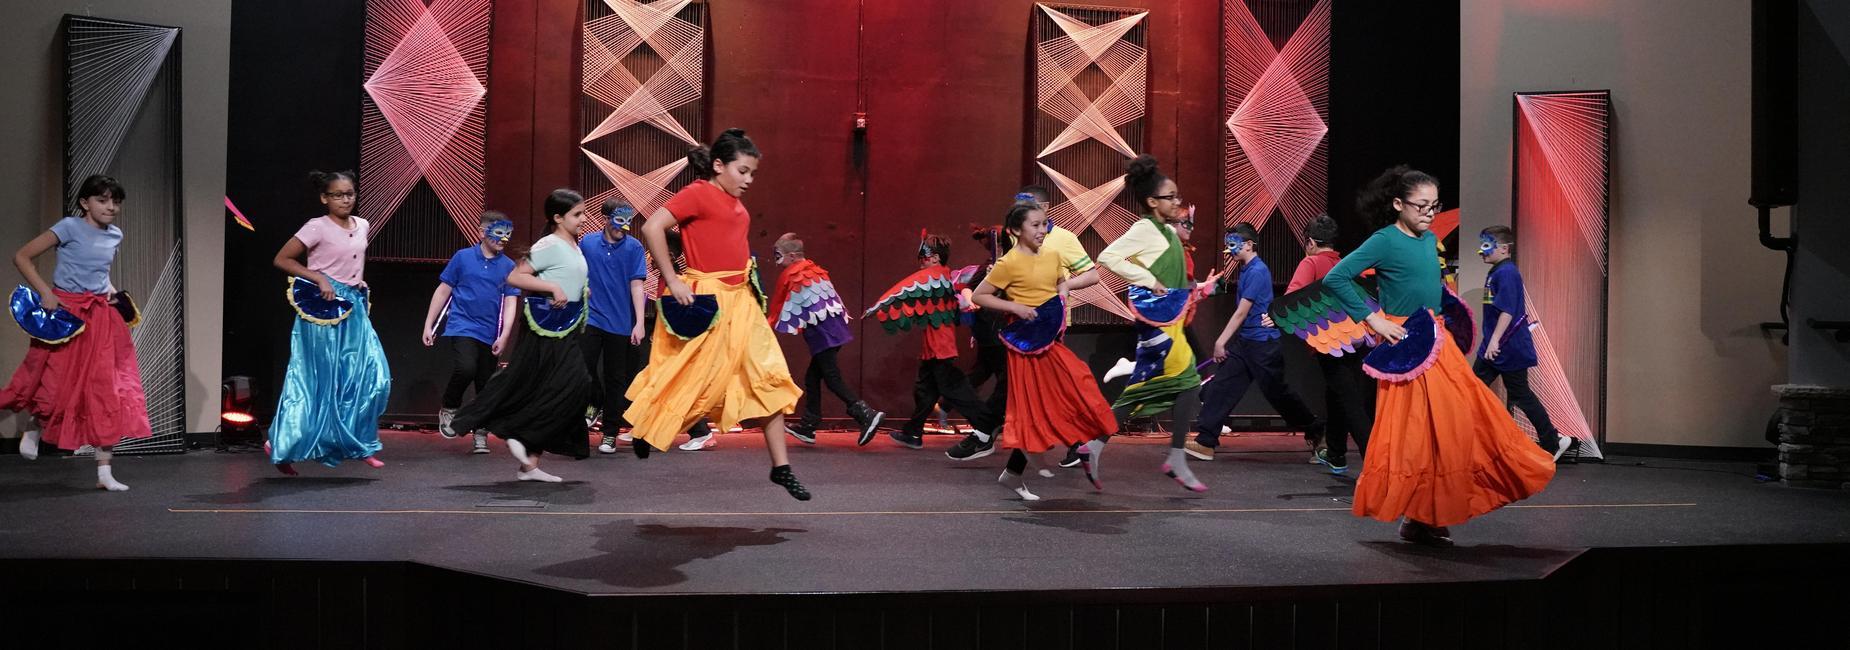 Students dance